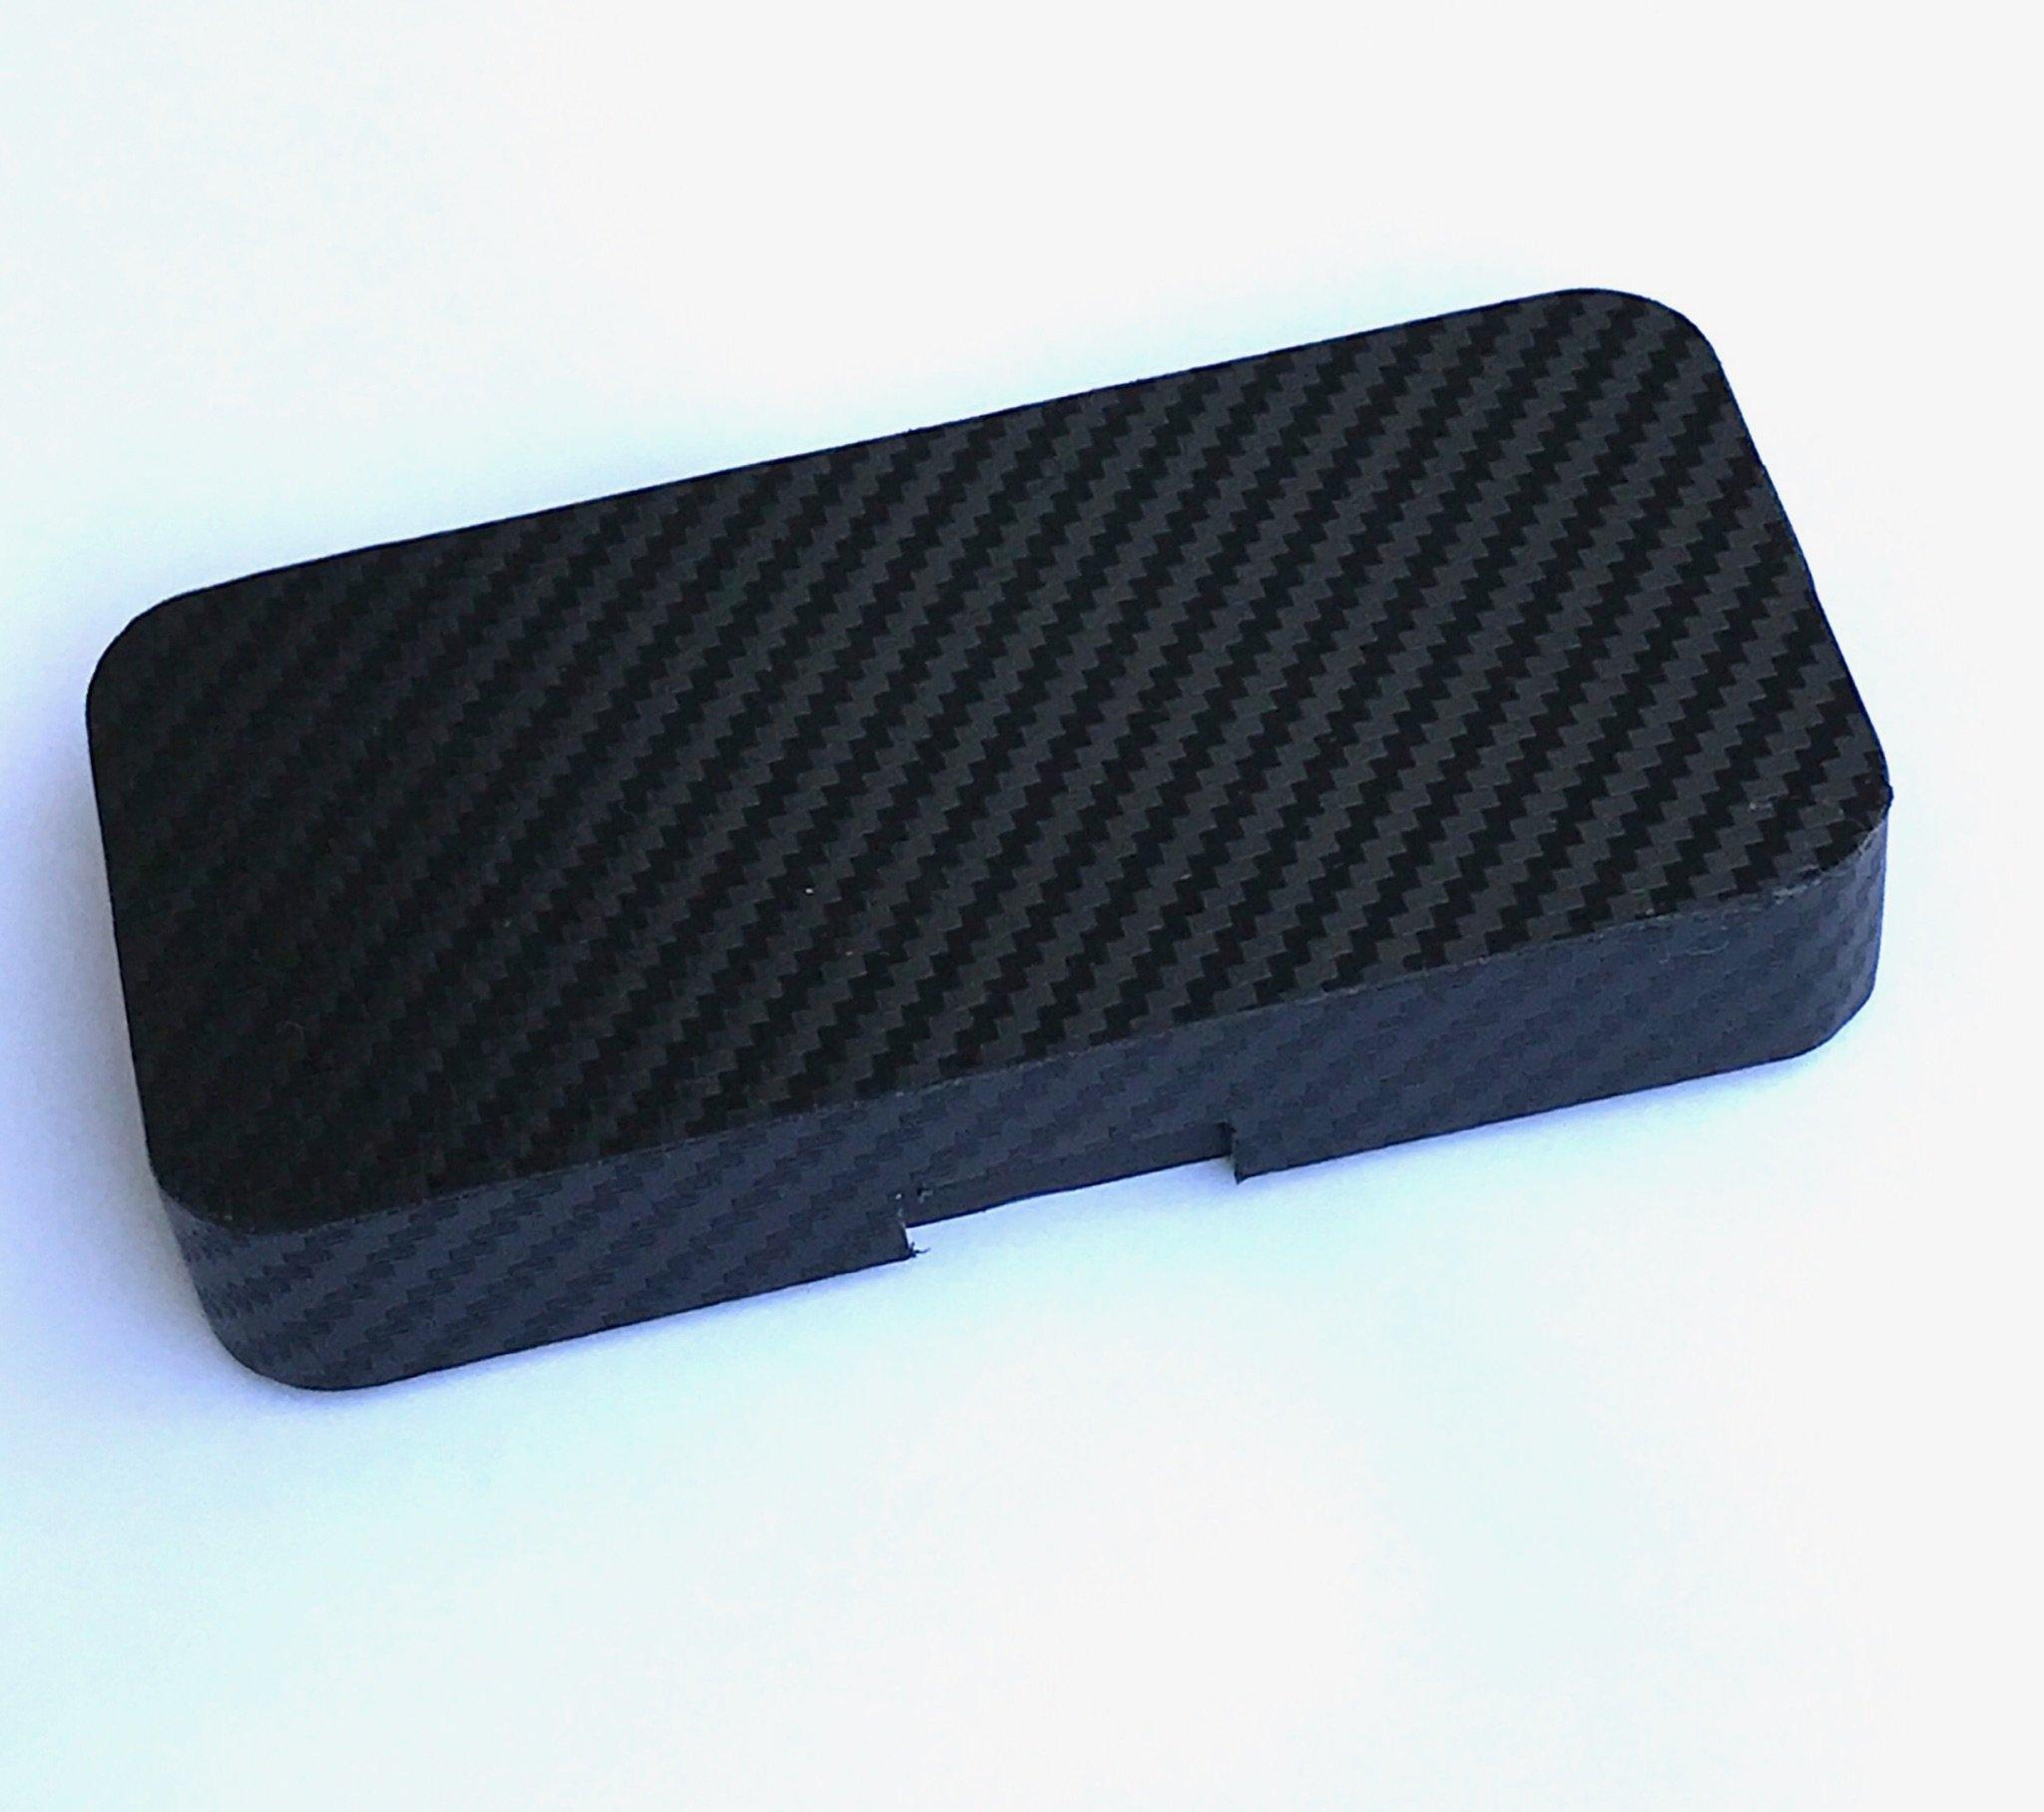 JUUL travel case Black Carbon Fiber Wrapped by Jwraps by Jwraps (Image #4)